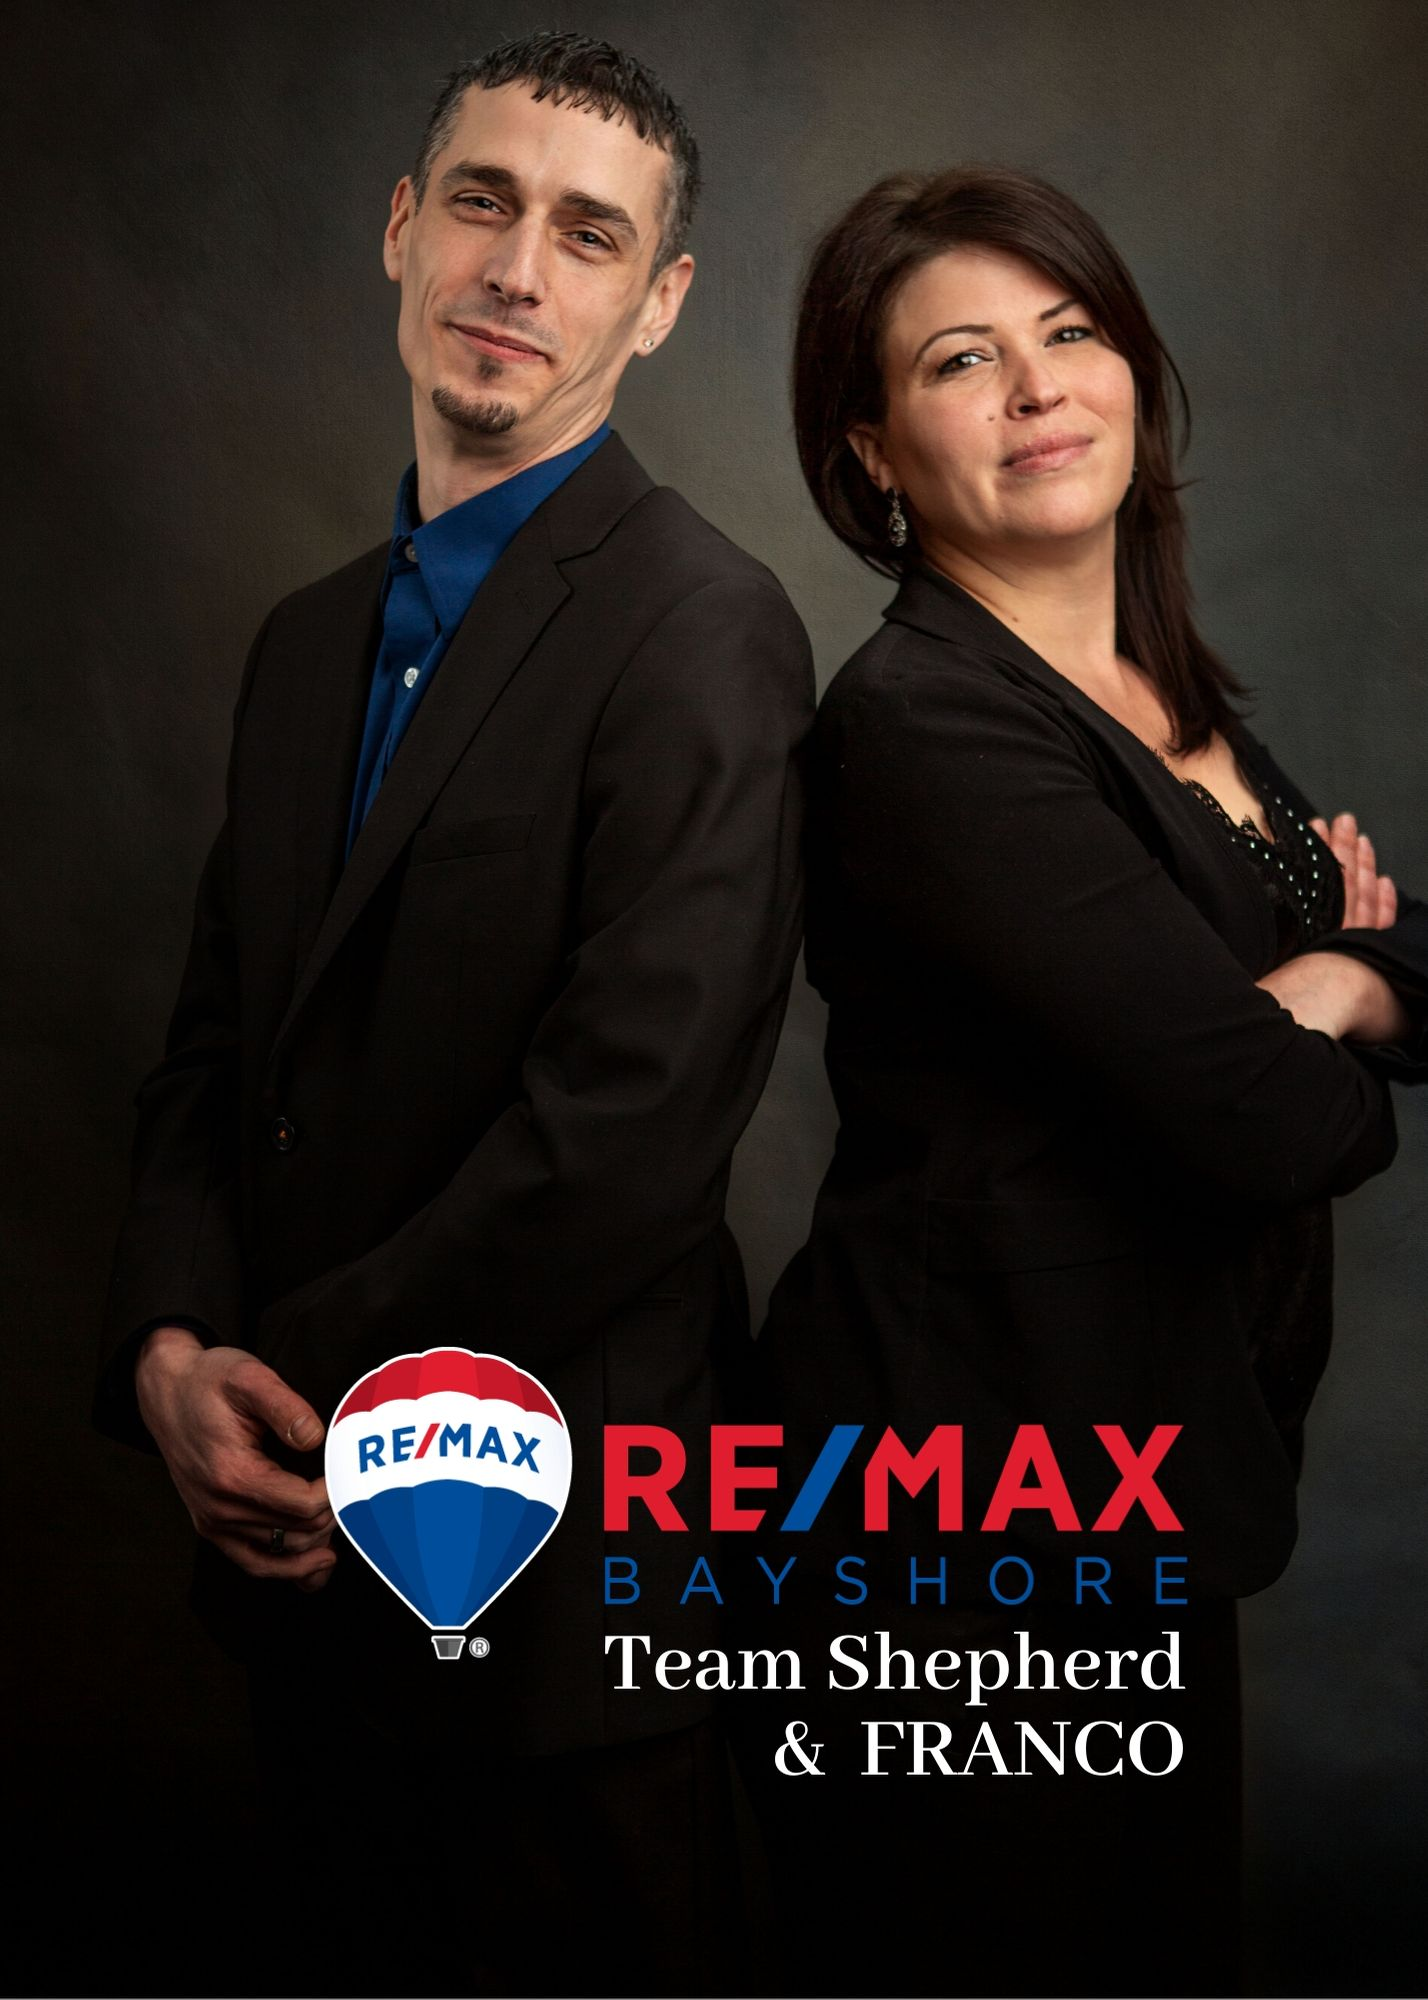 Team Shepherd & Franco